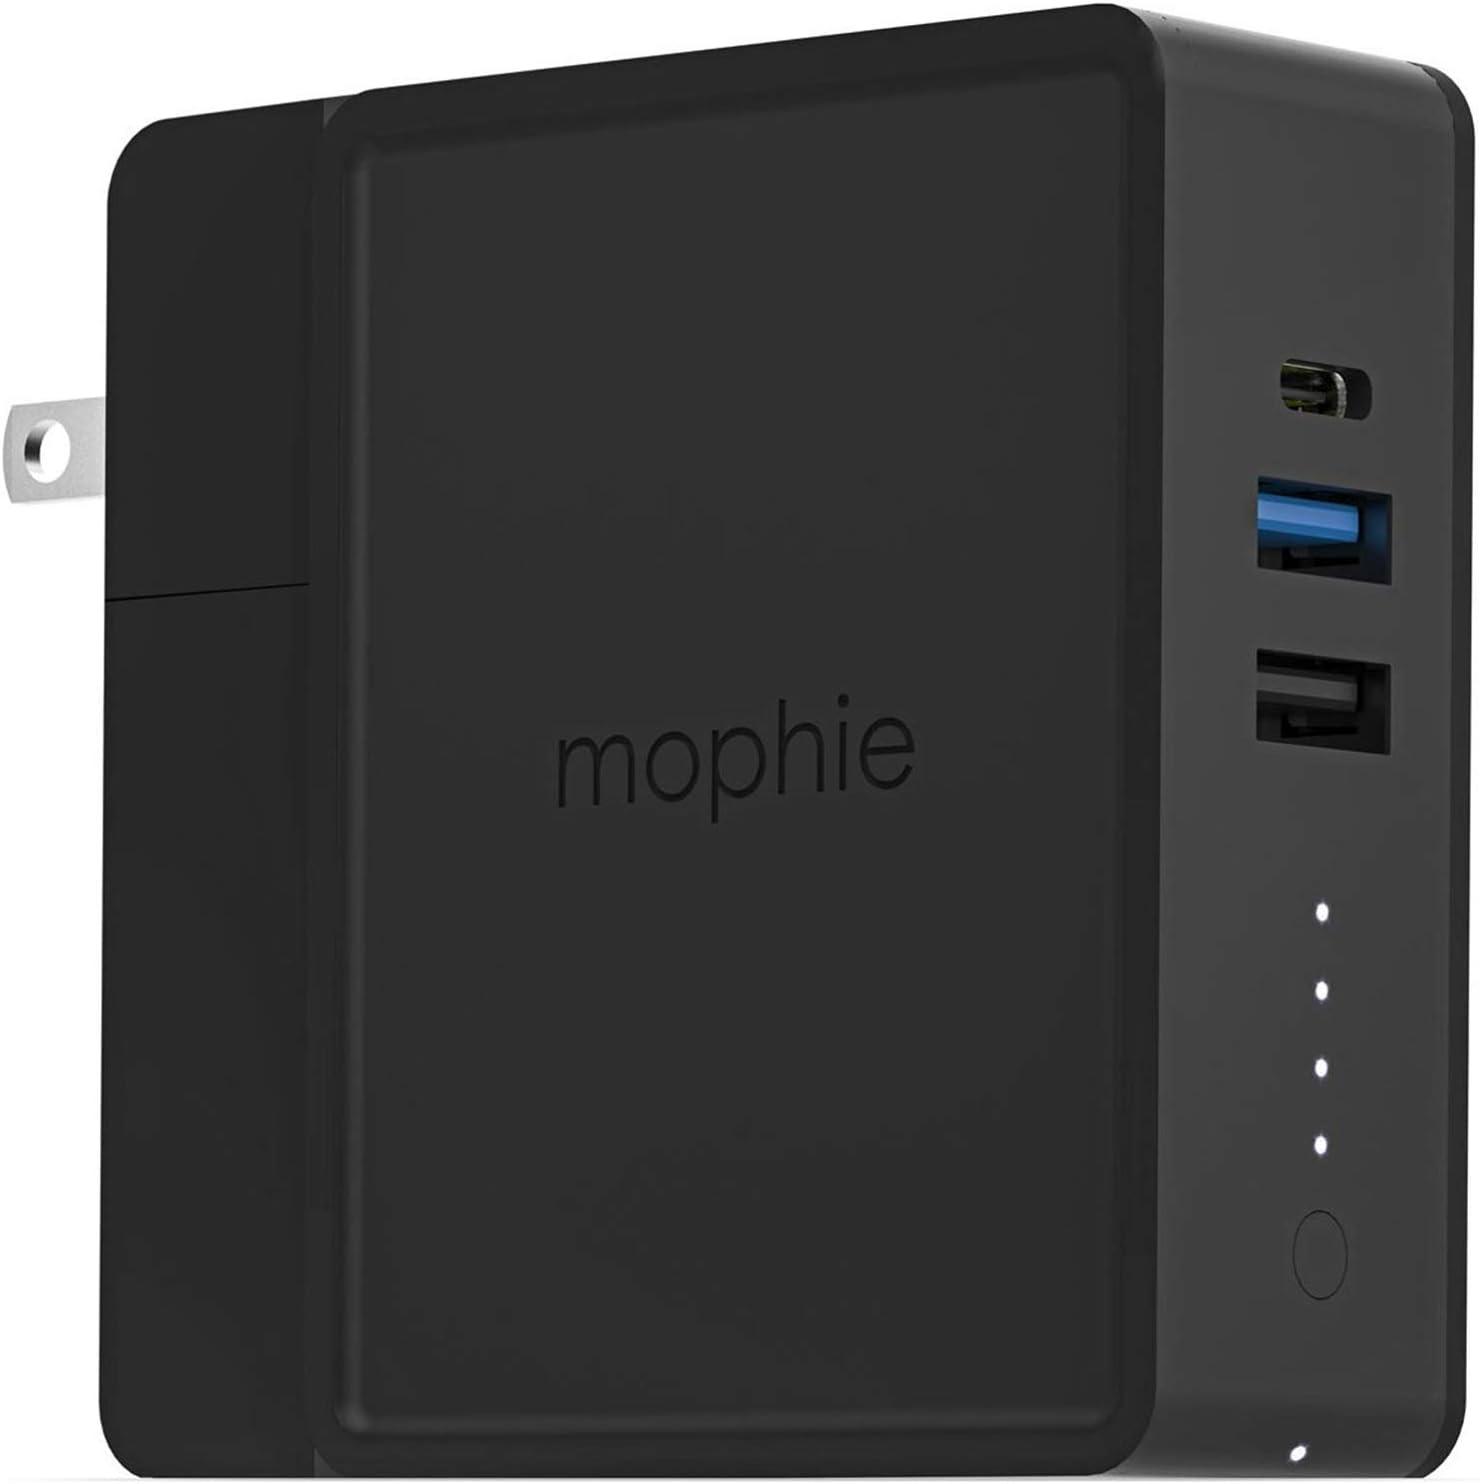 mophie powerstation hub - Portable Battery hub with: Amazon.co.uk: Electronics